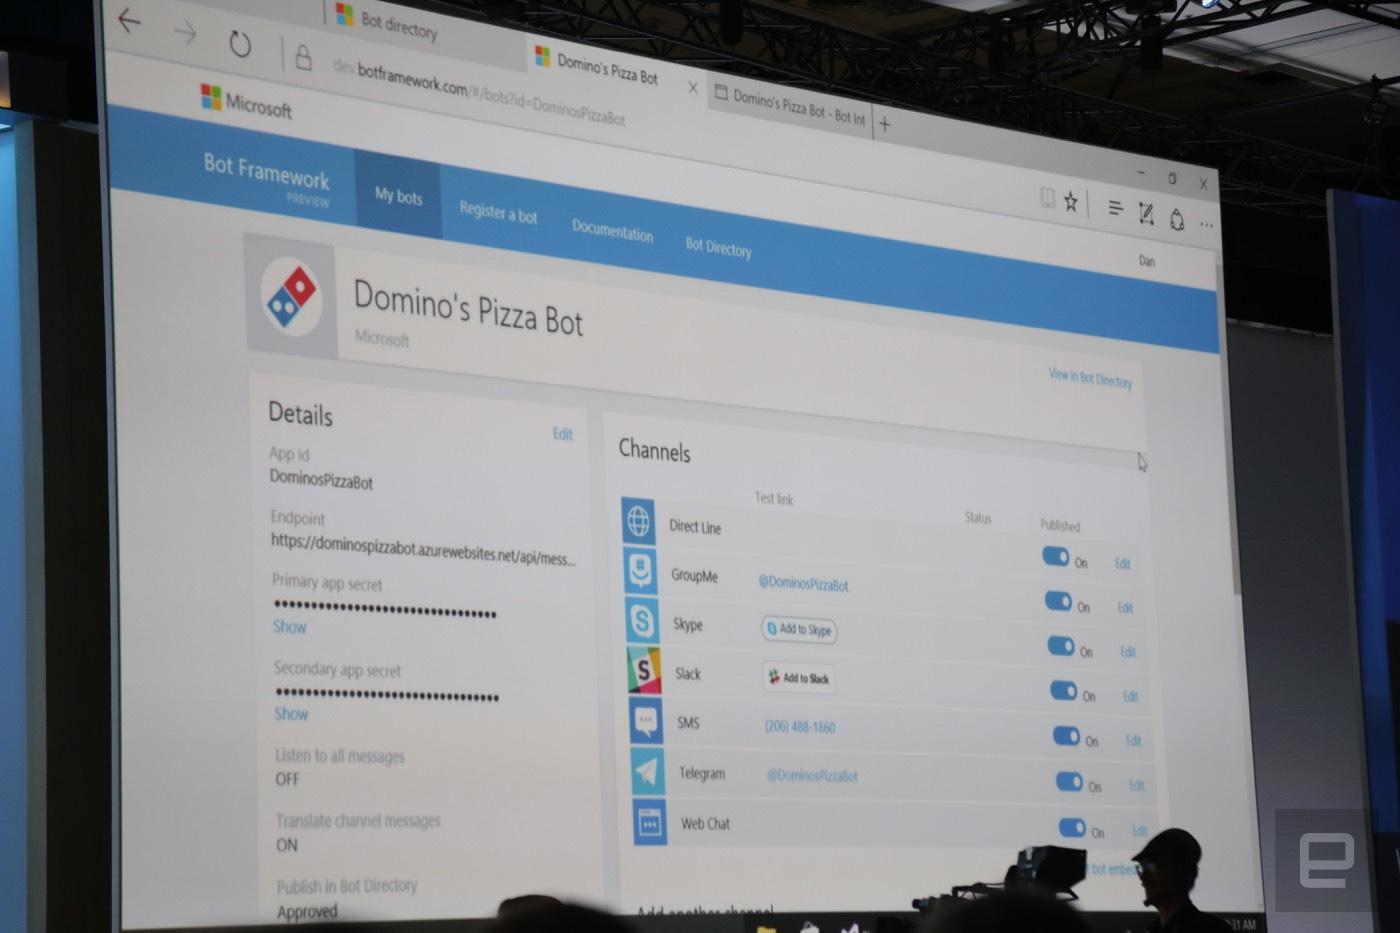 Domino's Pizzabot